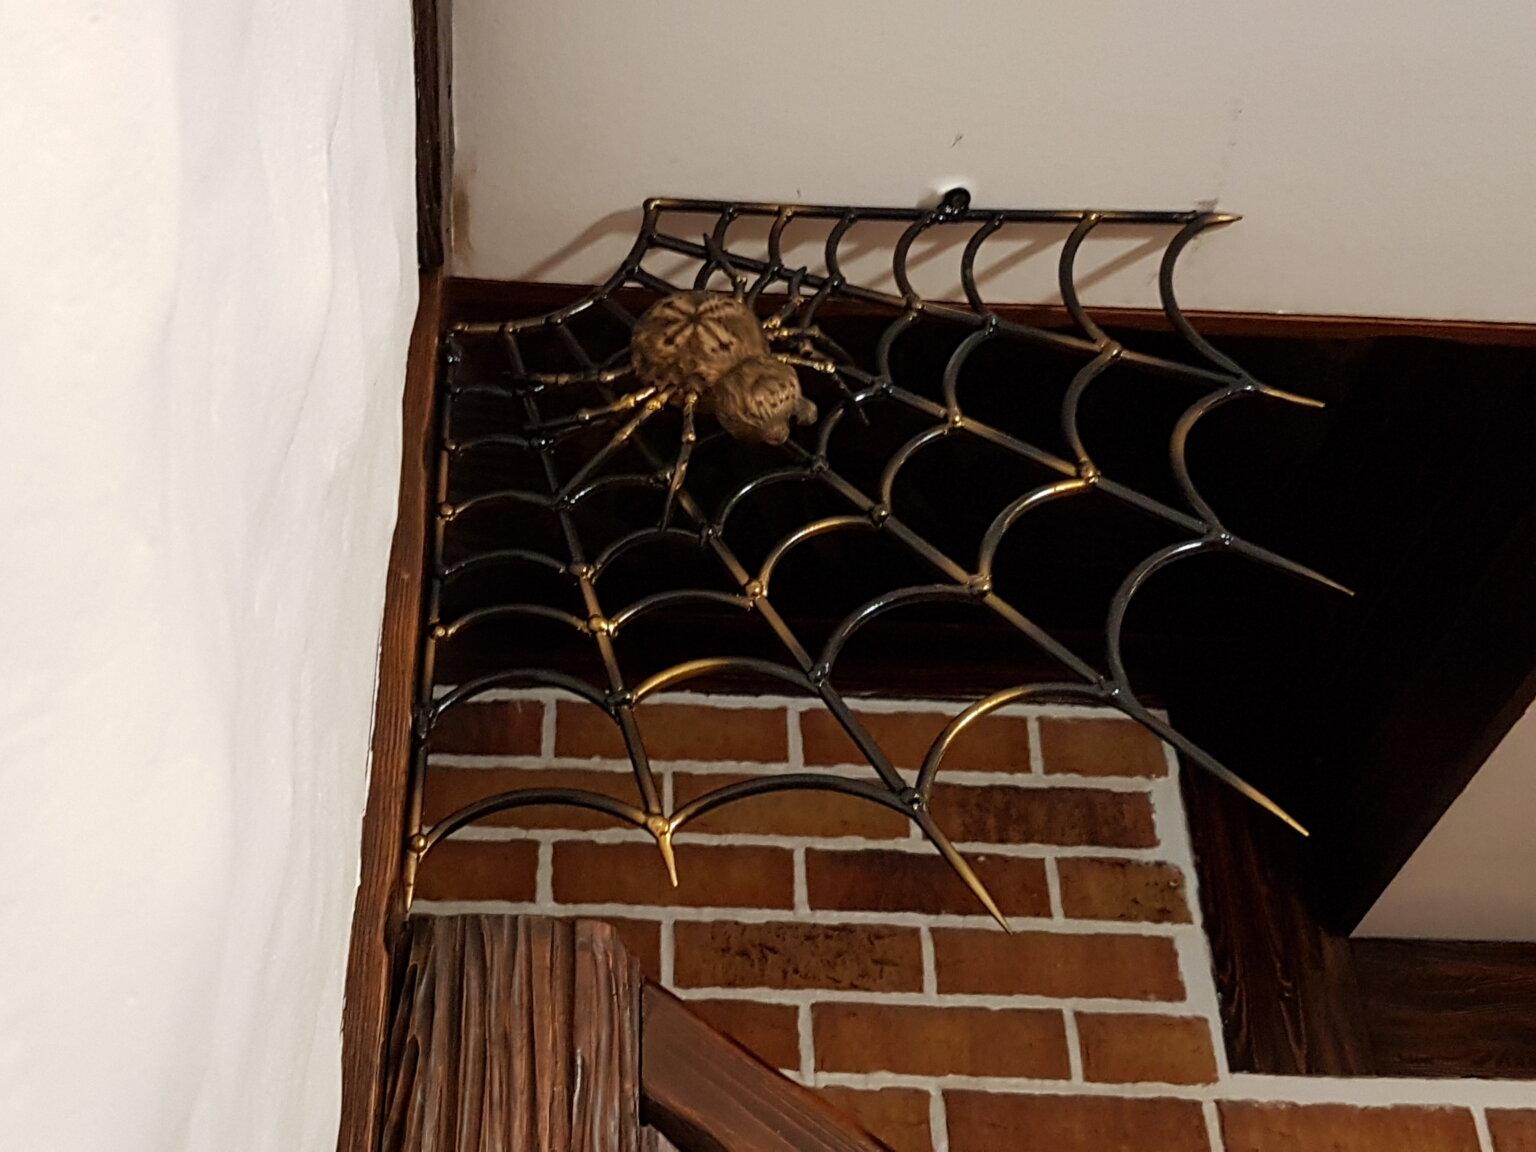 Скульптура паука на стальной паутине